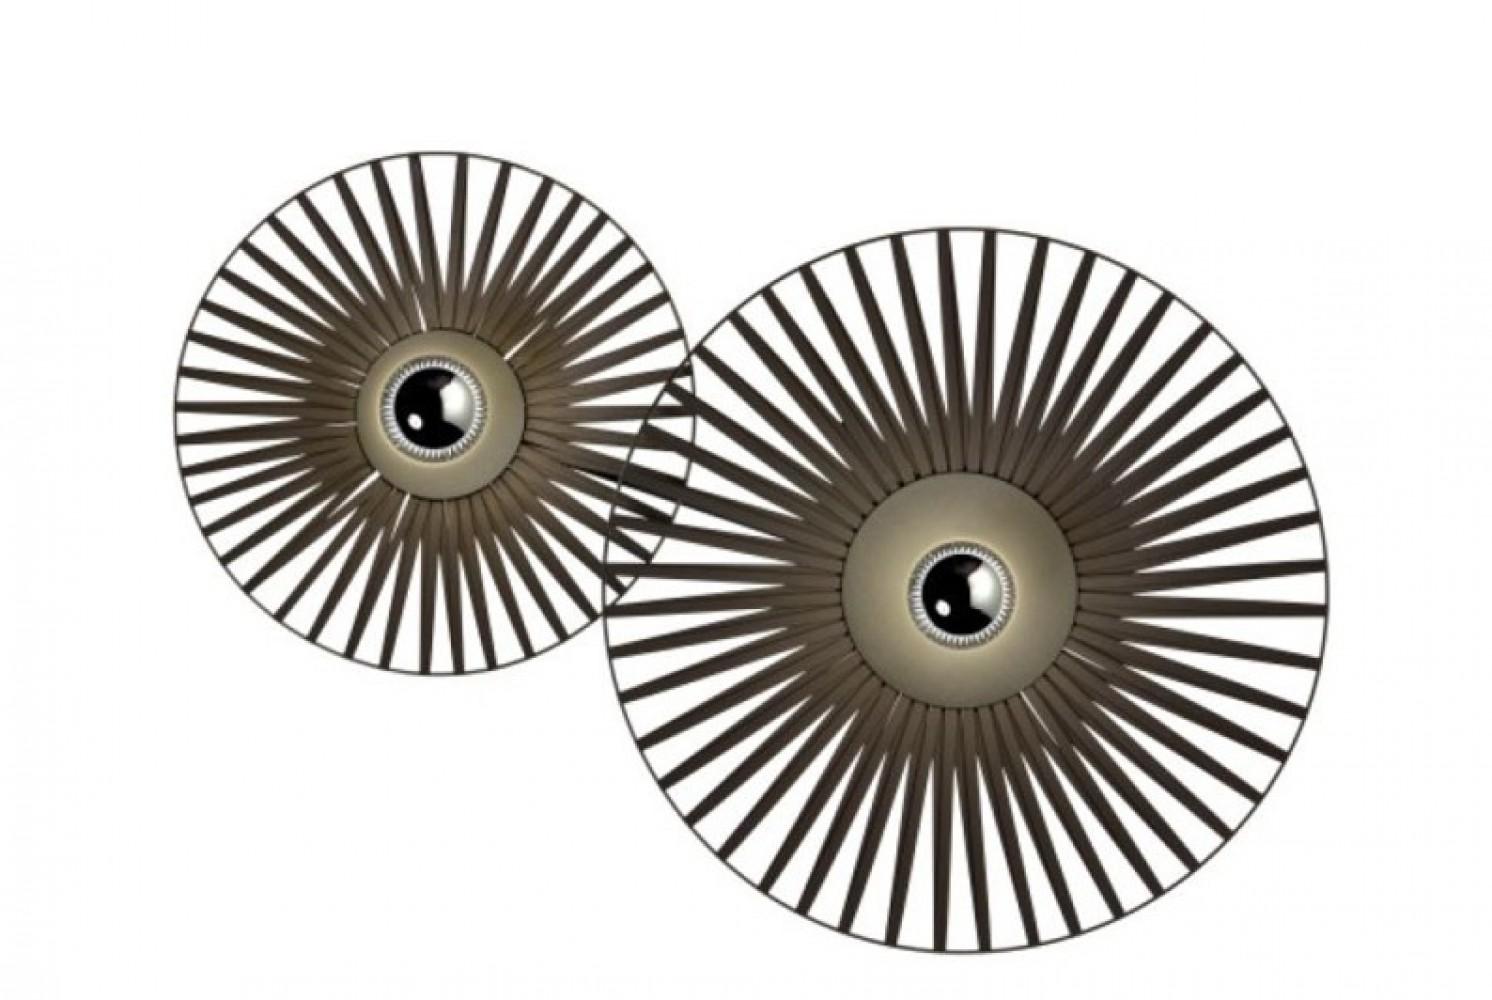 Applique Thelma Harpo - Noir - 2 lumières